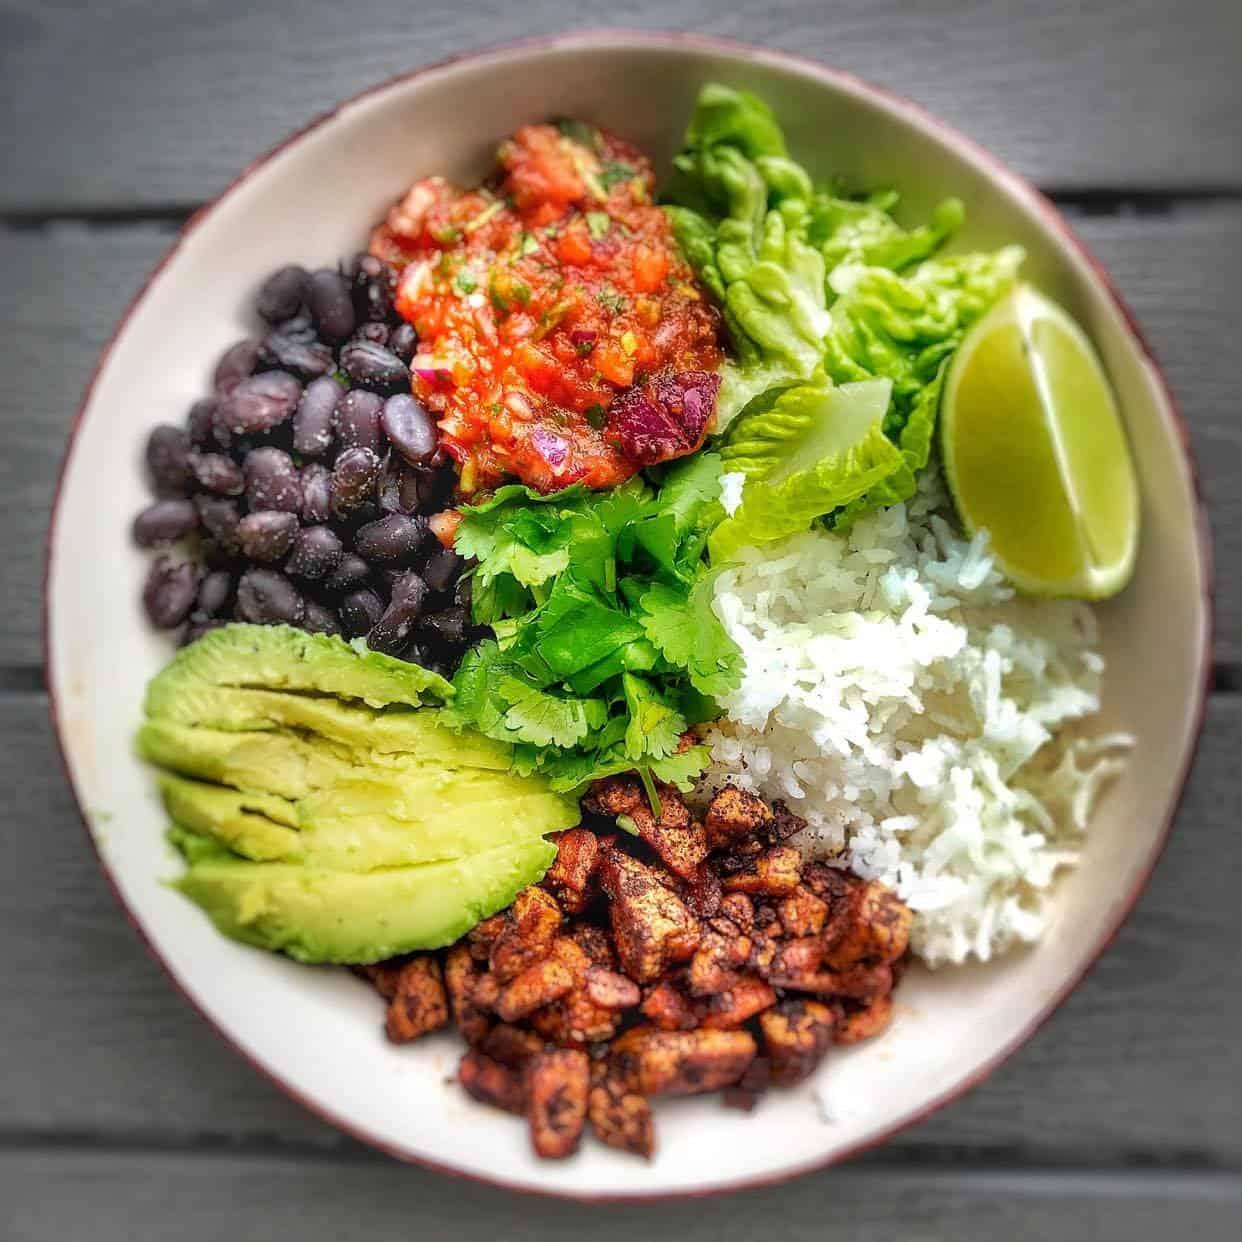 Vegan burrito bowl with easy homemade salsa.